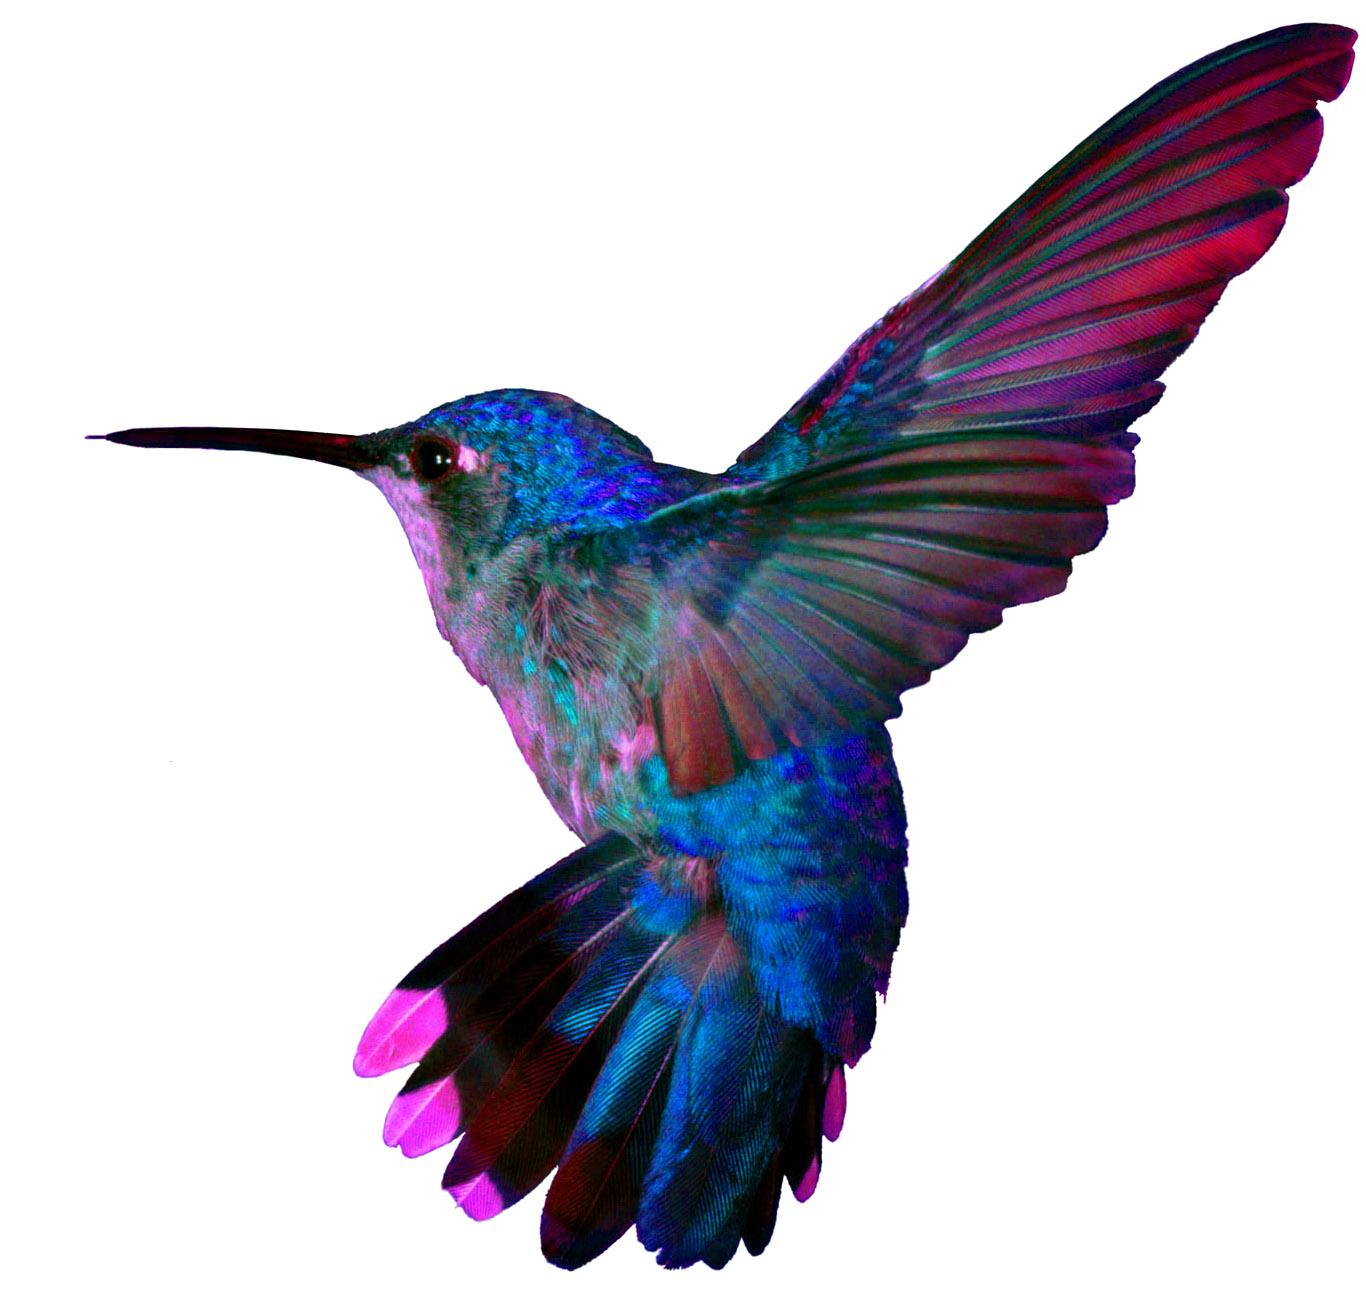 Hummingbird4 Png 1366 1295 Hummingbird Tattoo Colorful Hummingbird Tattoo Hummingbird Painting